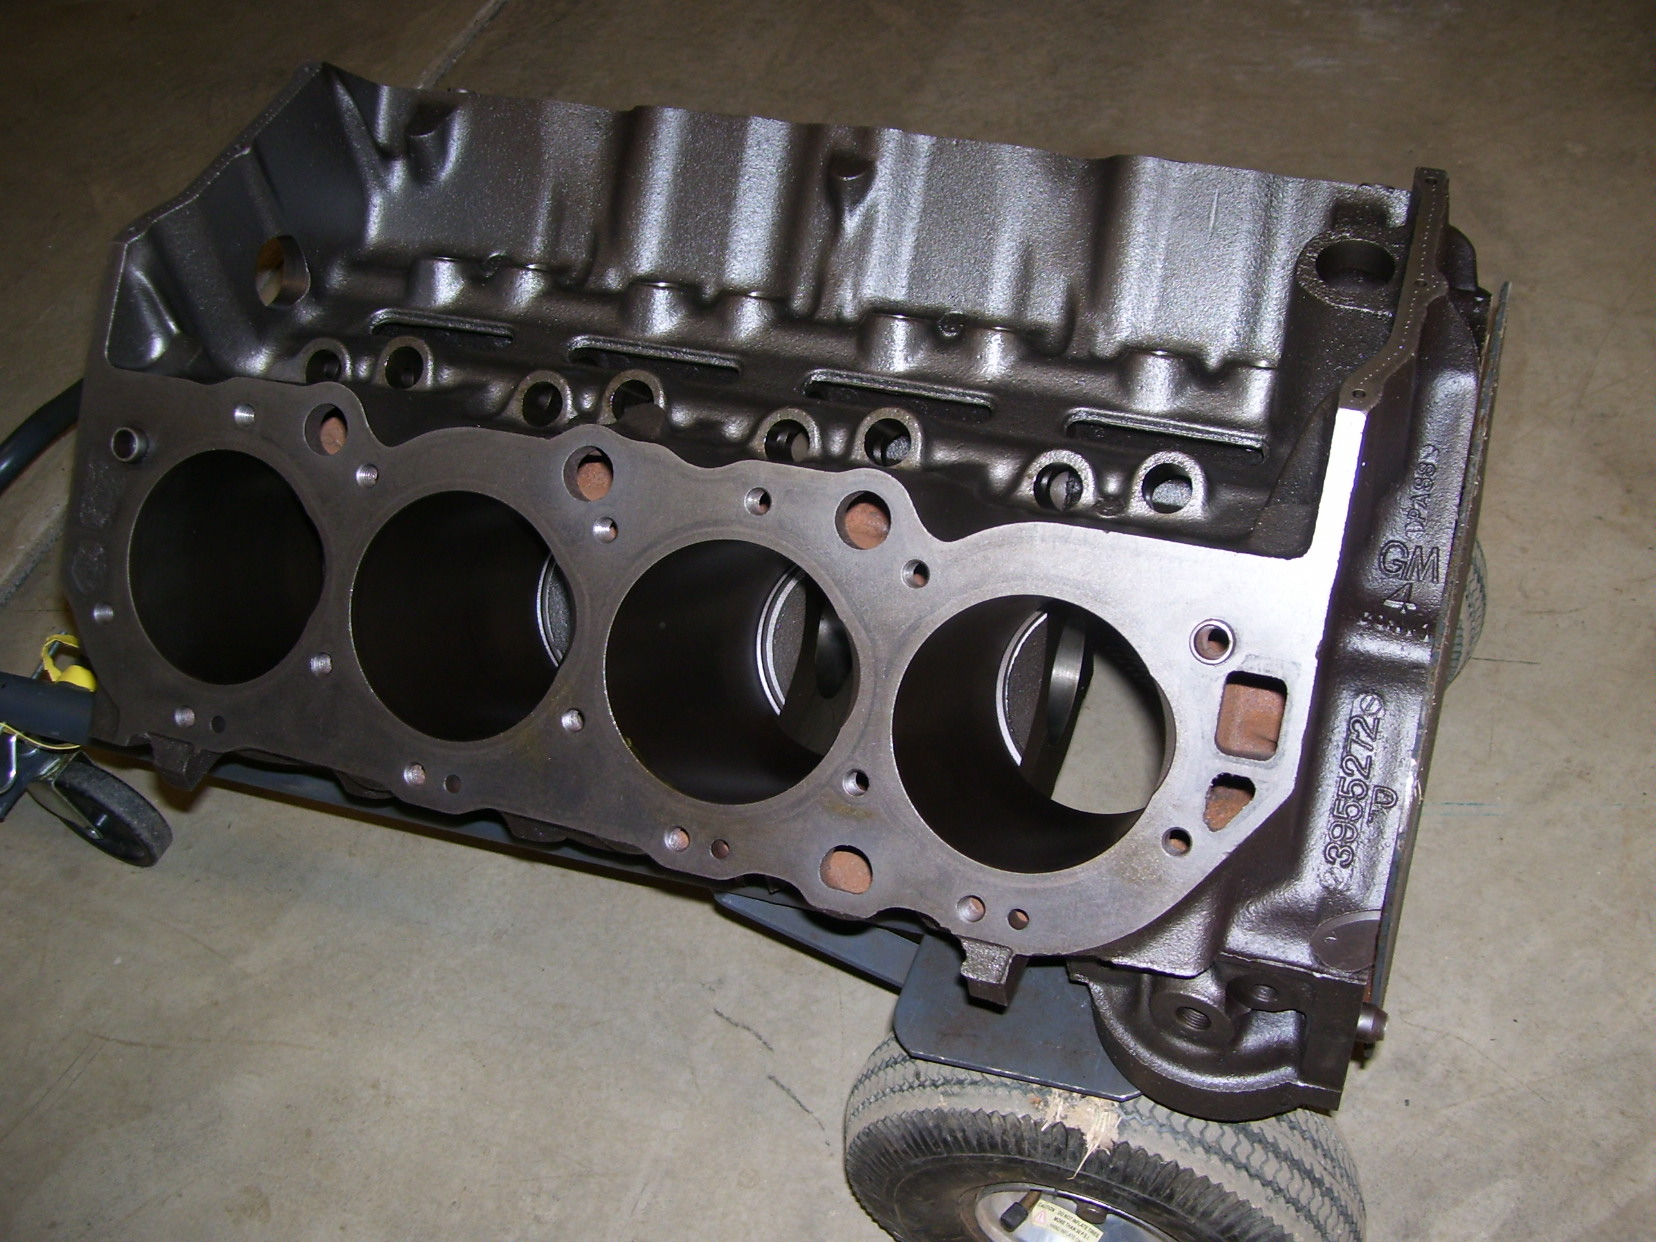 Hot Rod Engine Tech Finding Vintage Big Blocks - Hot Rod Engine Tech